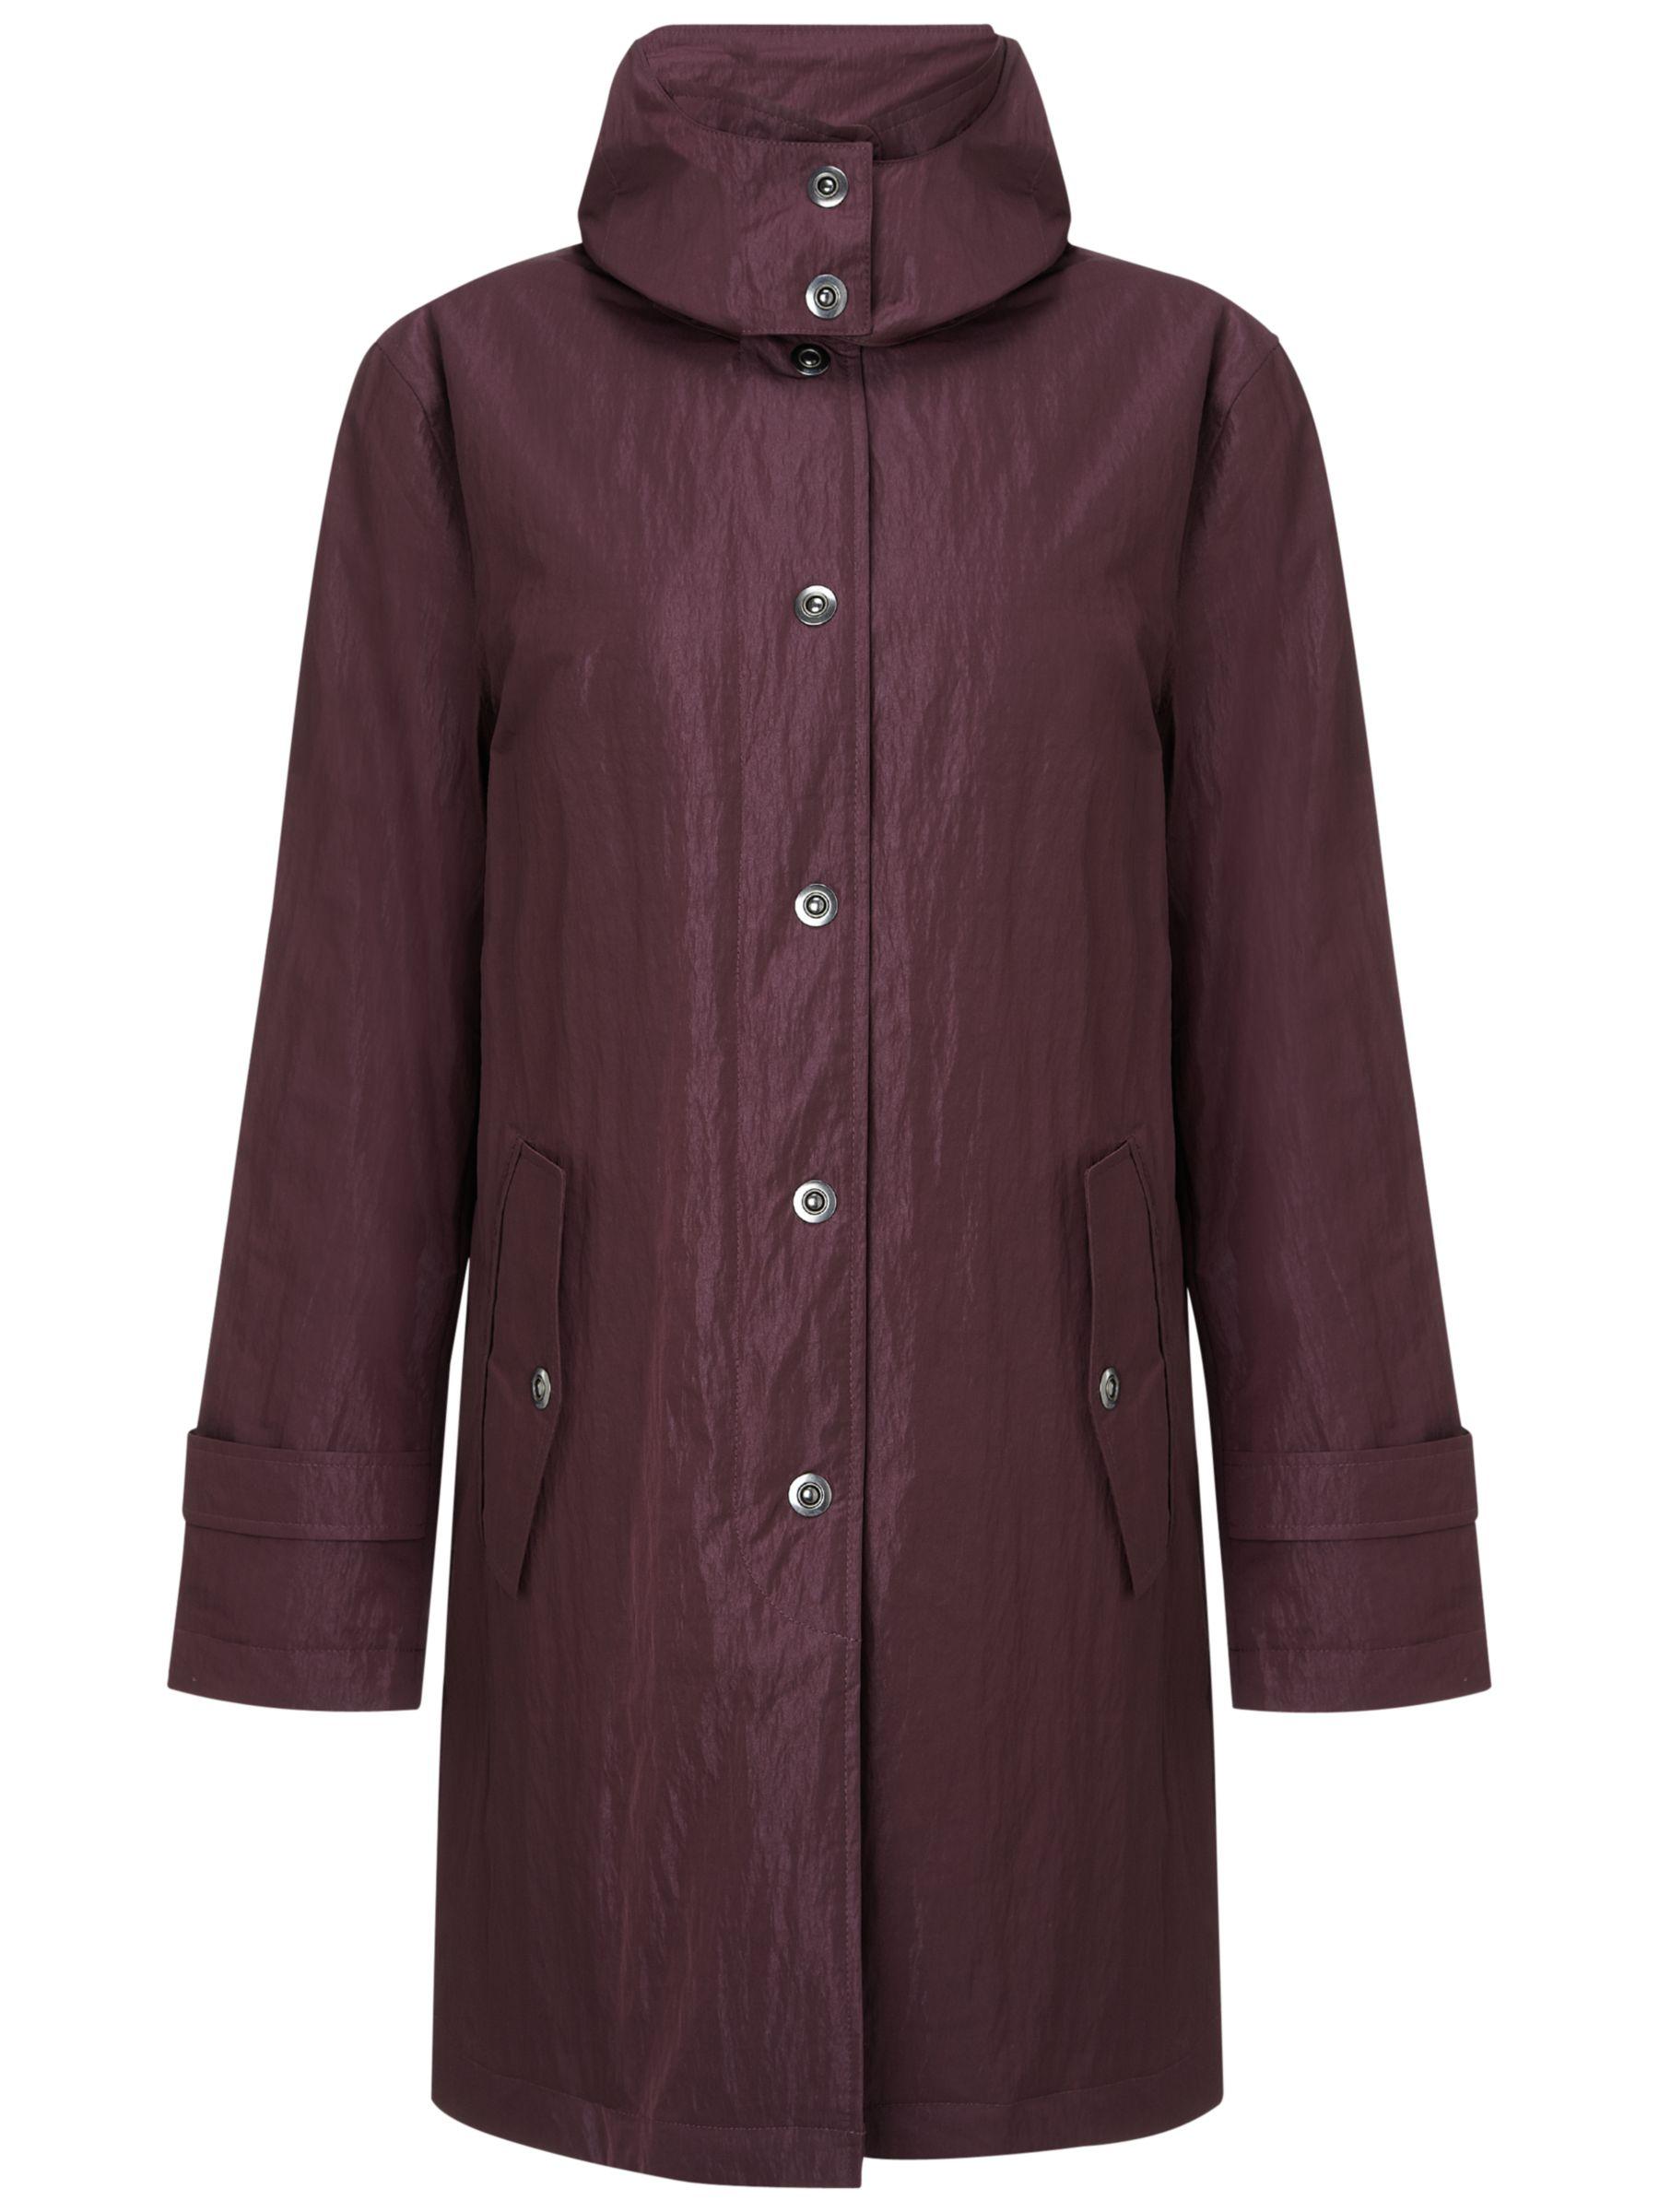 Four Seasons Hooded Caban Rain Coat